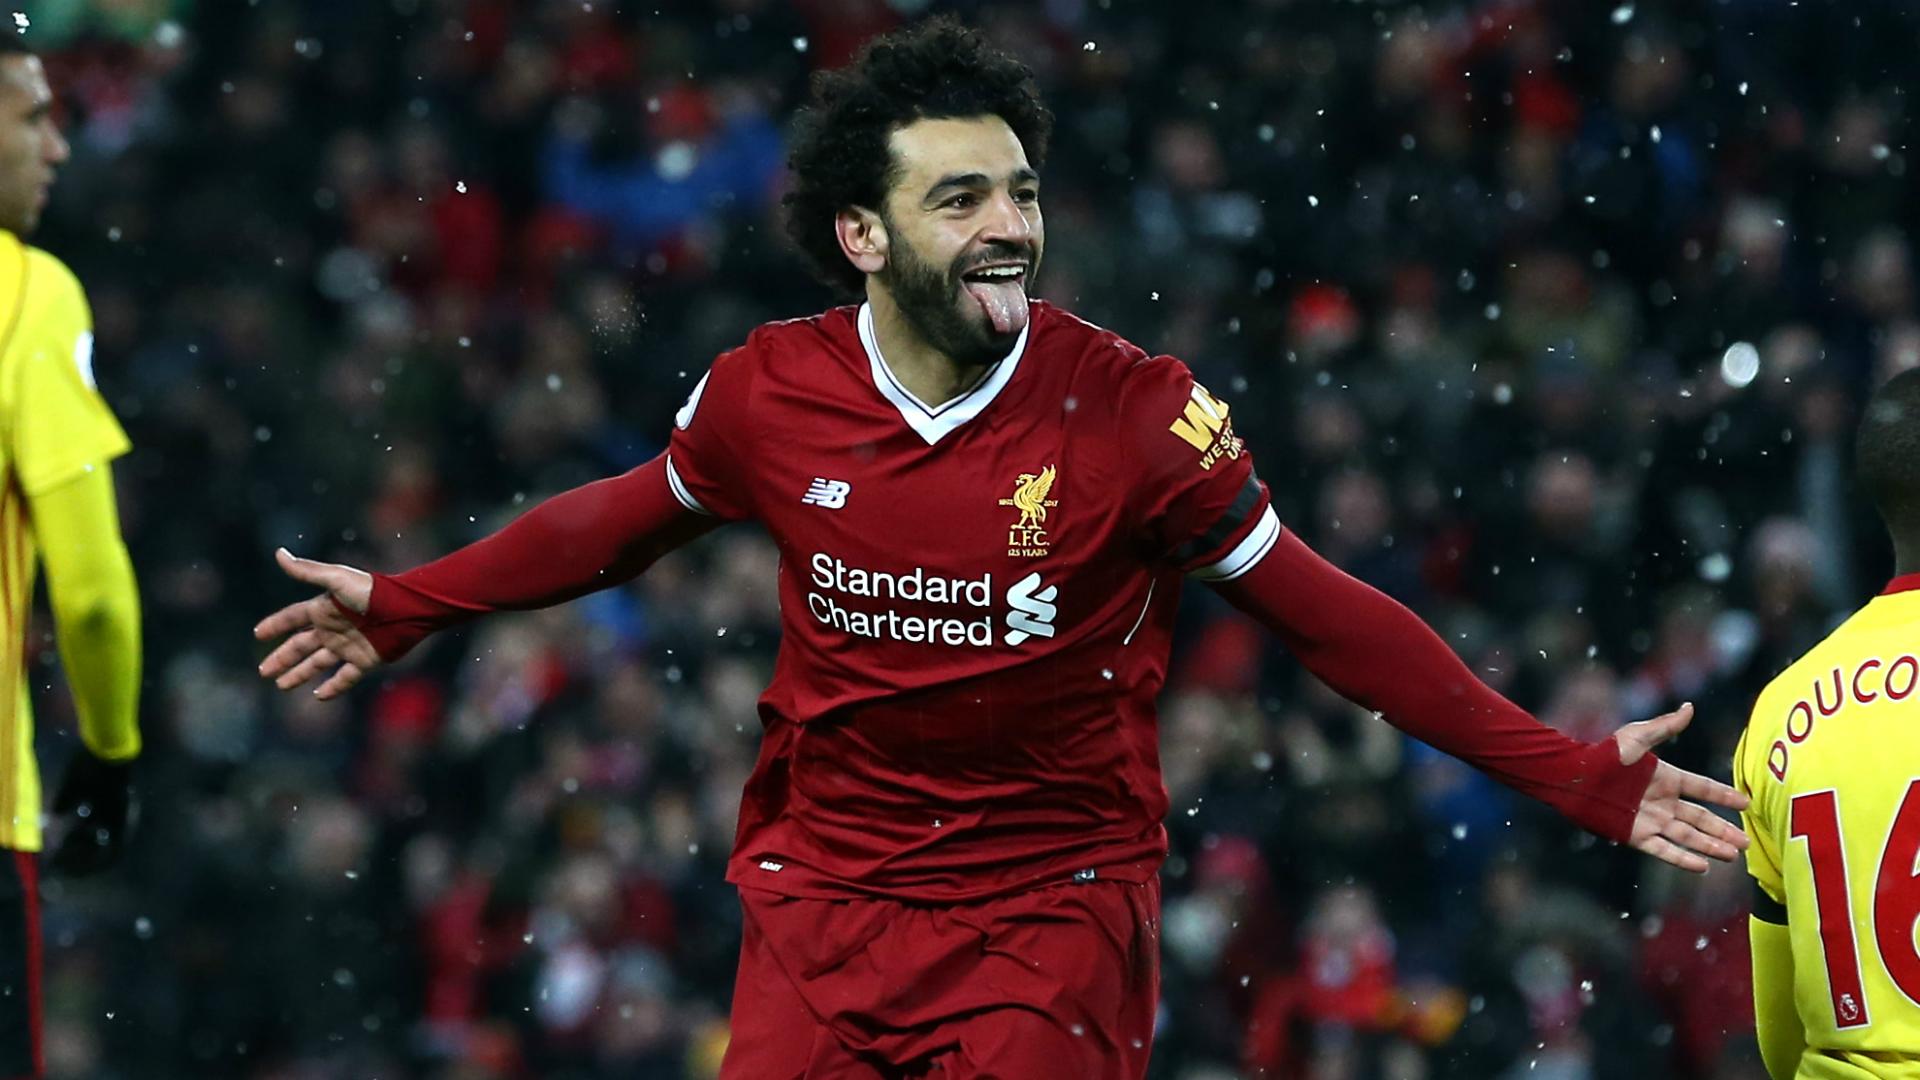 Salah And Liverpool Don't Fear Man City: We've Beaten Them